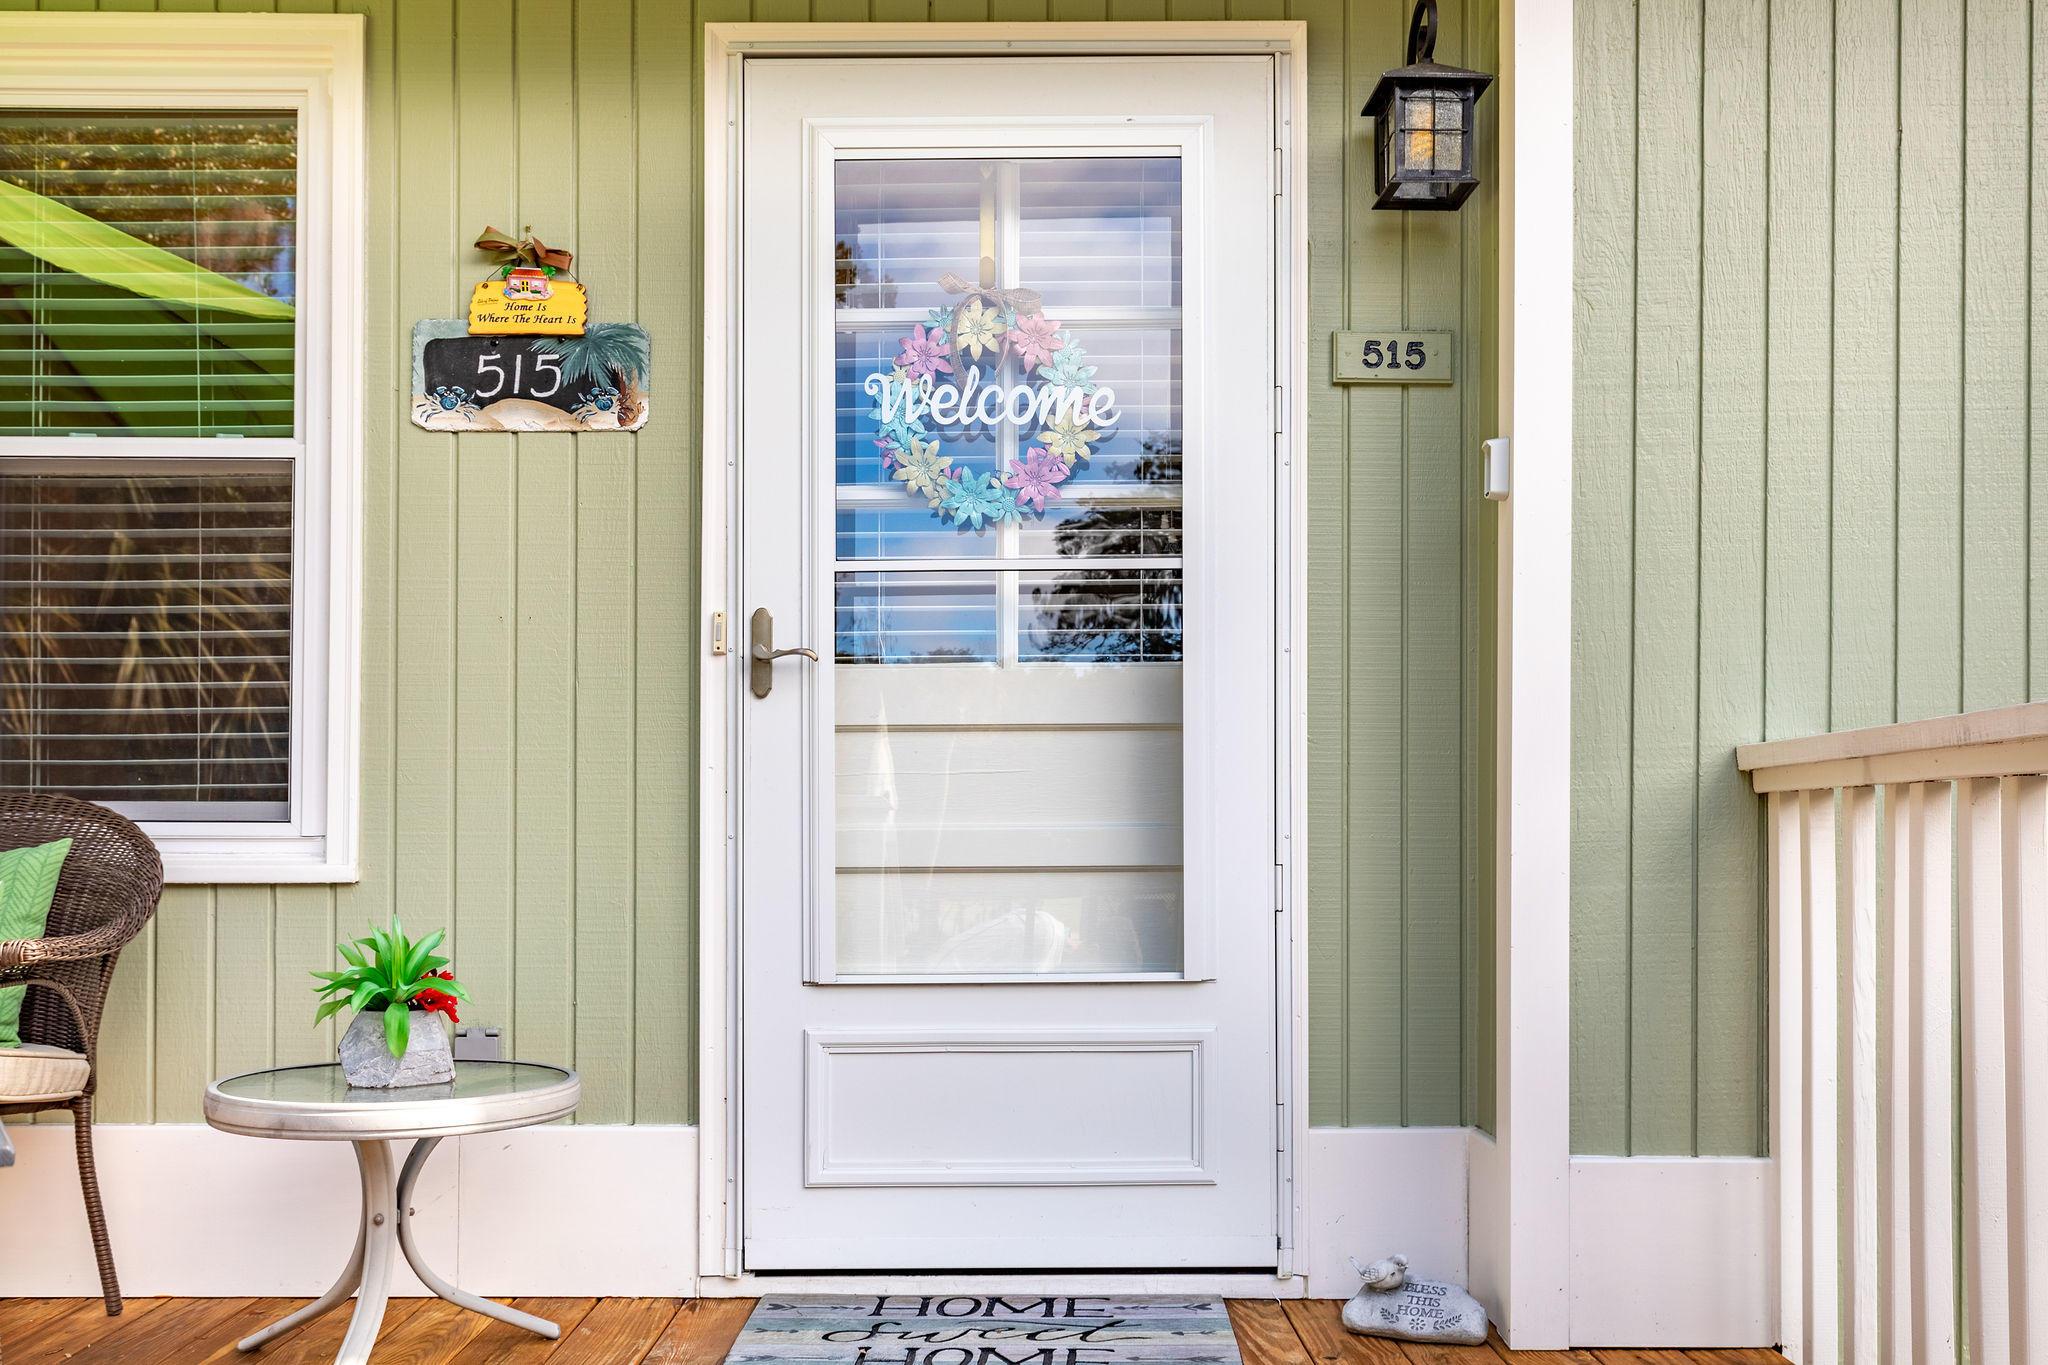 Seabrook Island Homes For Sale - 515 Cobby Creek, Seabrook Island, SC - 47